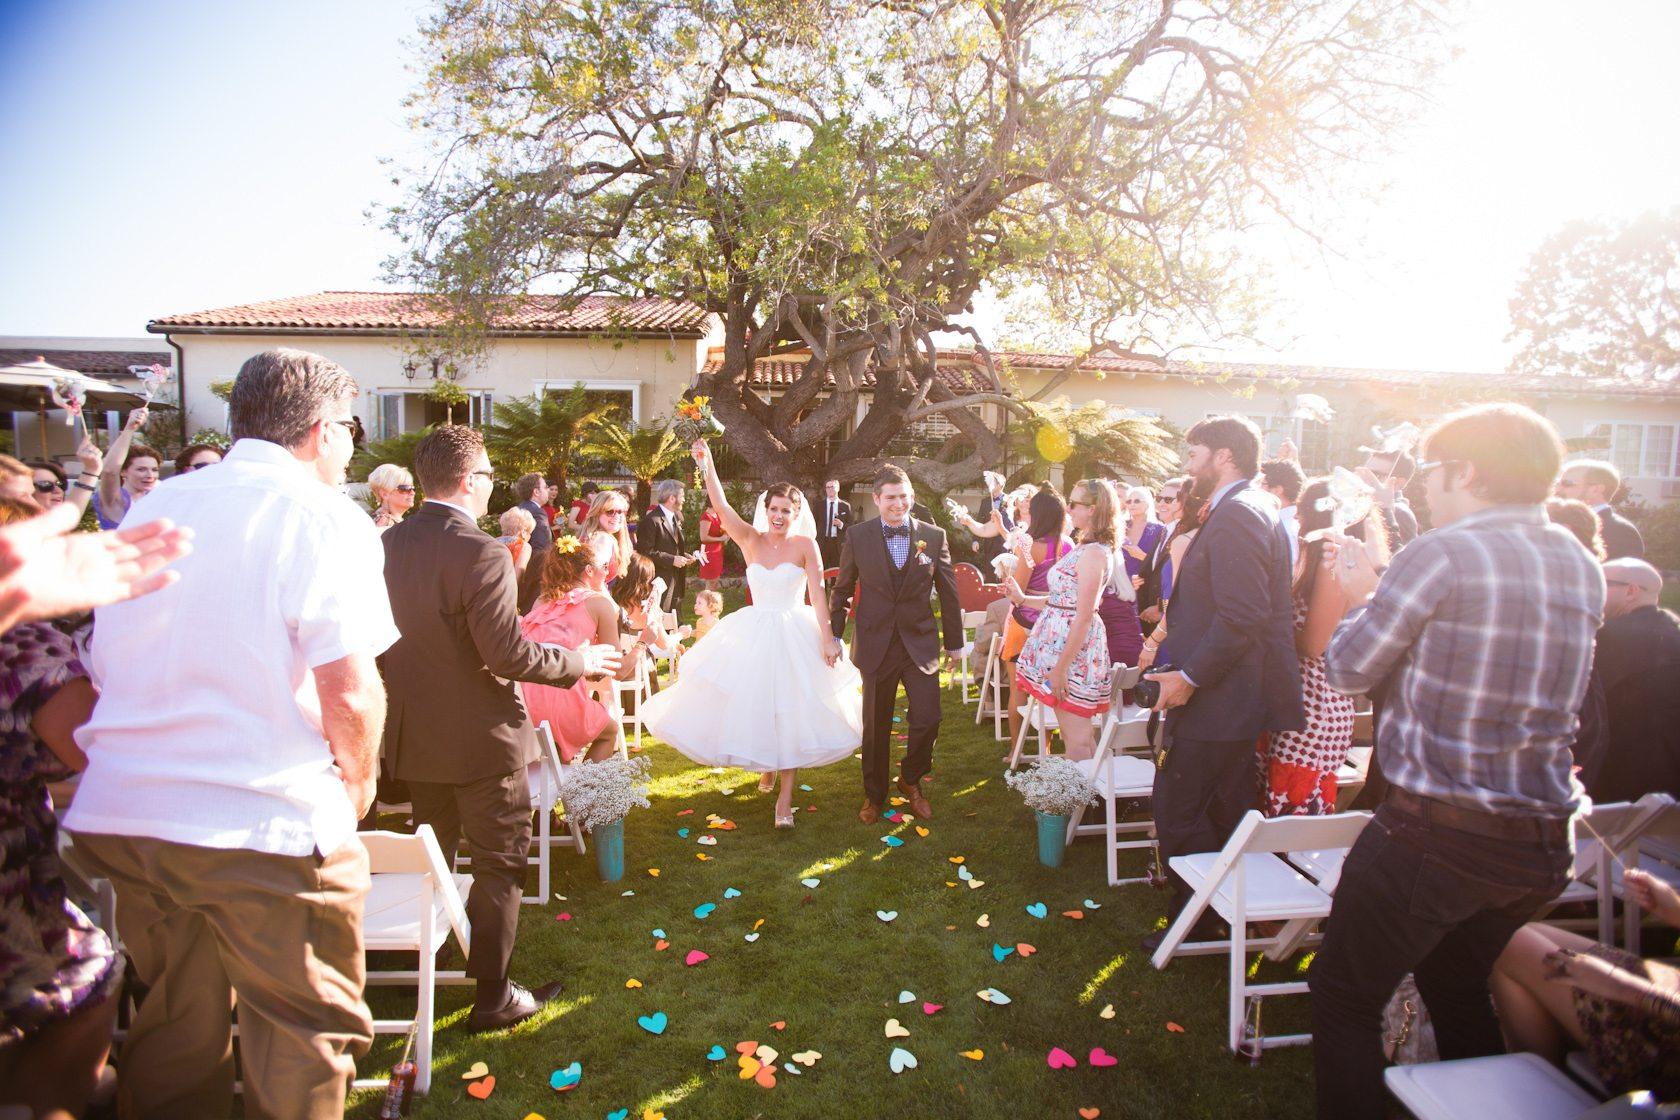 Rancho_Santa_Fe_Inn_40.jpg